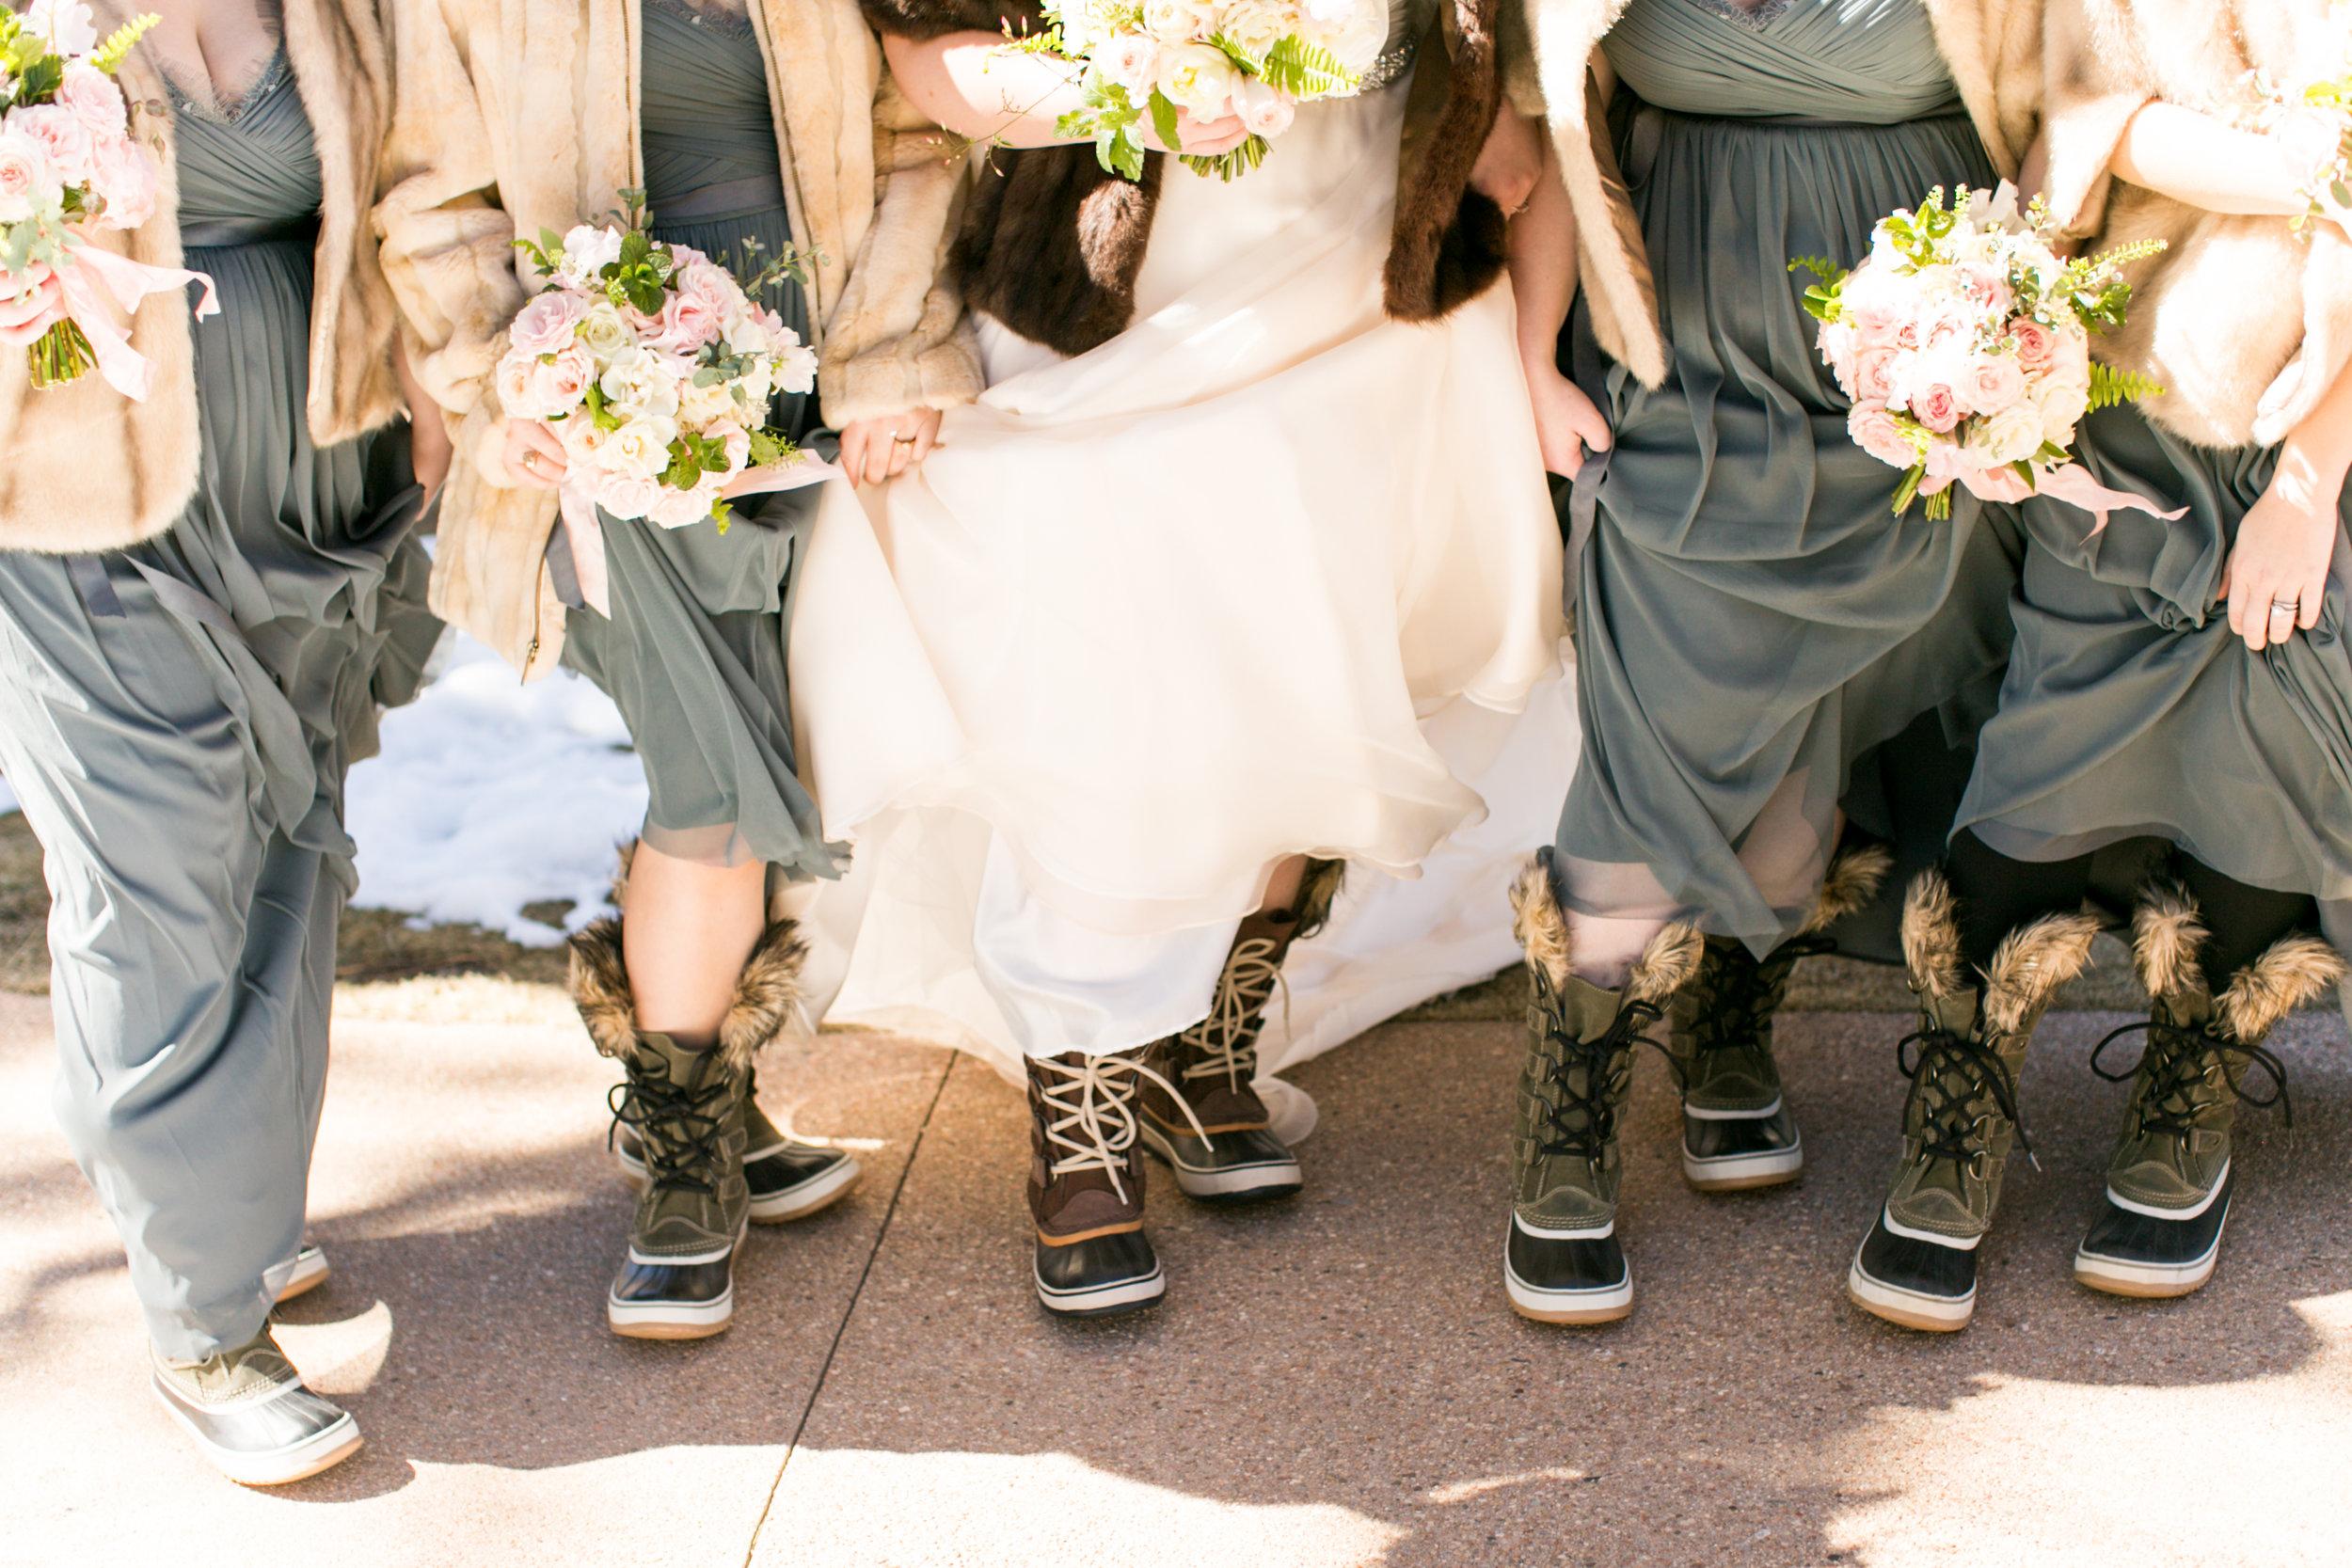 Twin_Owls_Steakhouse-wedding_photographer_Estes_Park_Lisa_ODwyer-180.jpg